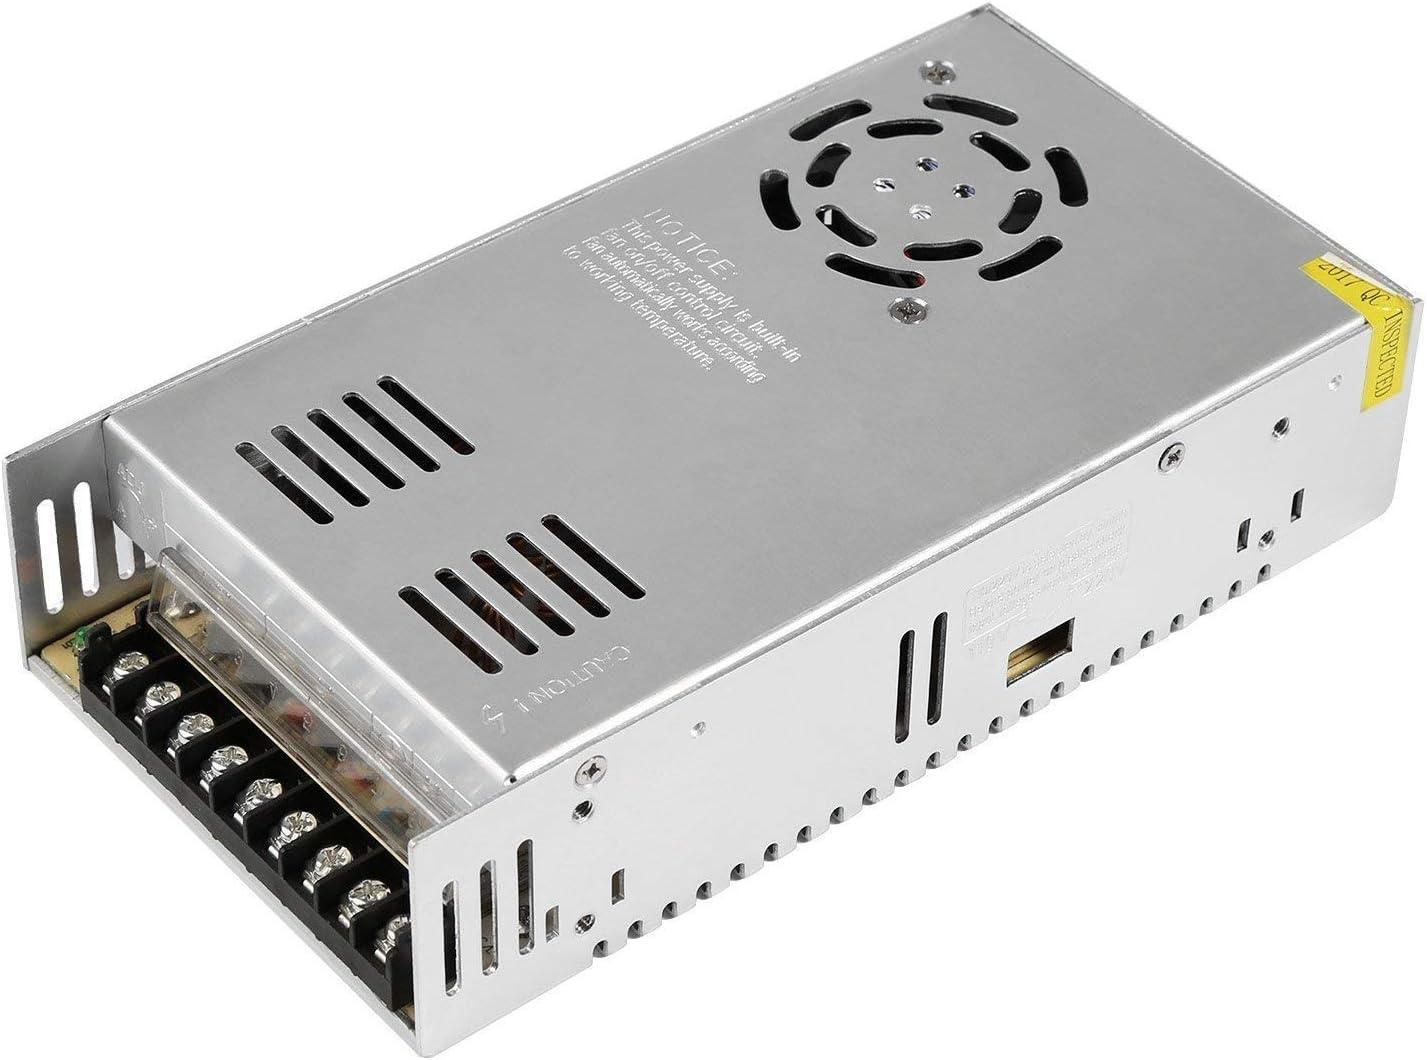 NEWSTYLE Fuente Alimentacion Transformador Interruptor DC 12V 30A 360W para CCTV, Radio, Proyecto de Computadora (12V 30A)